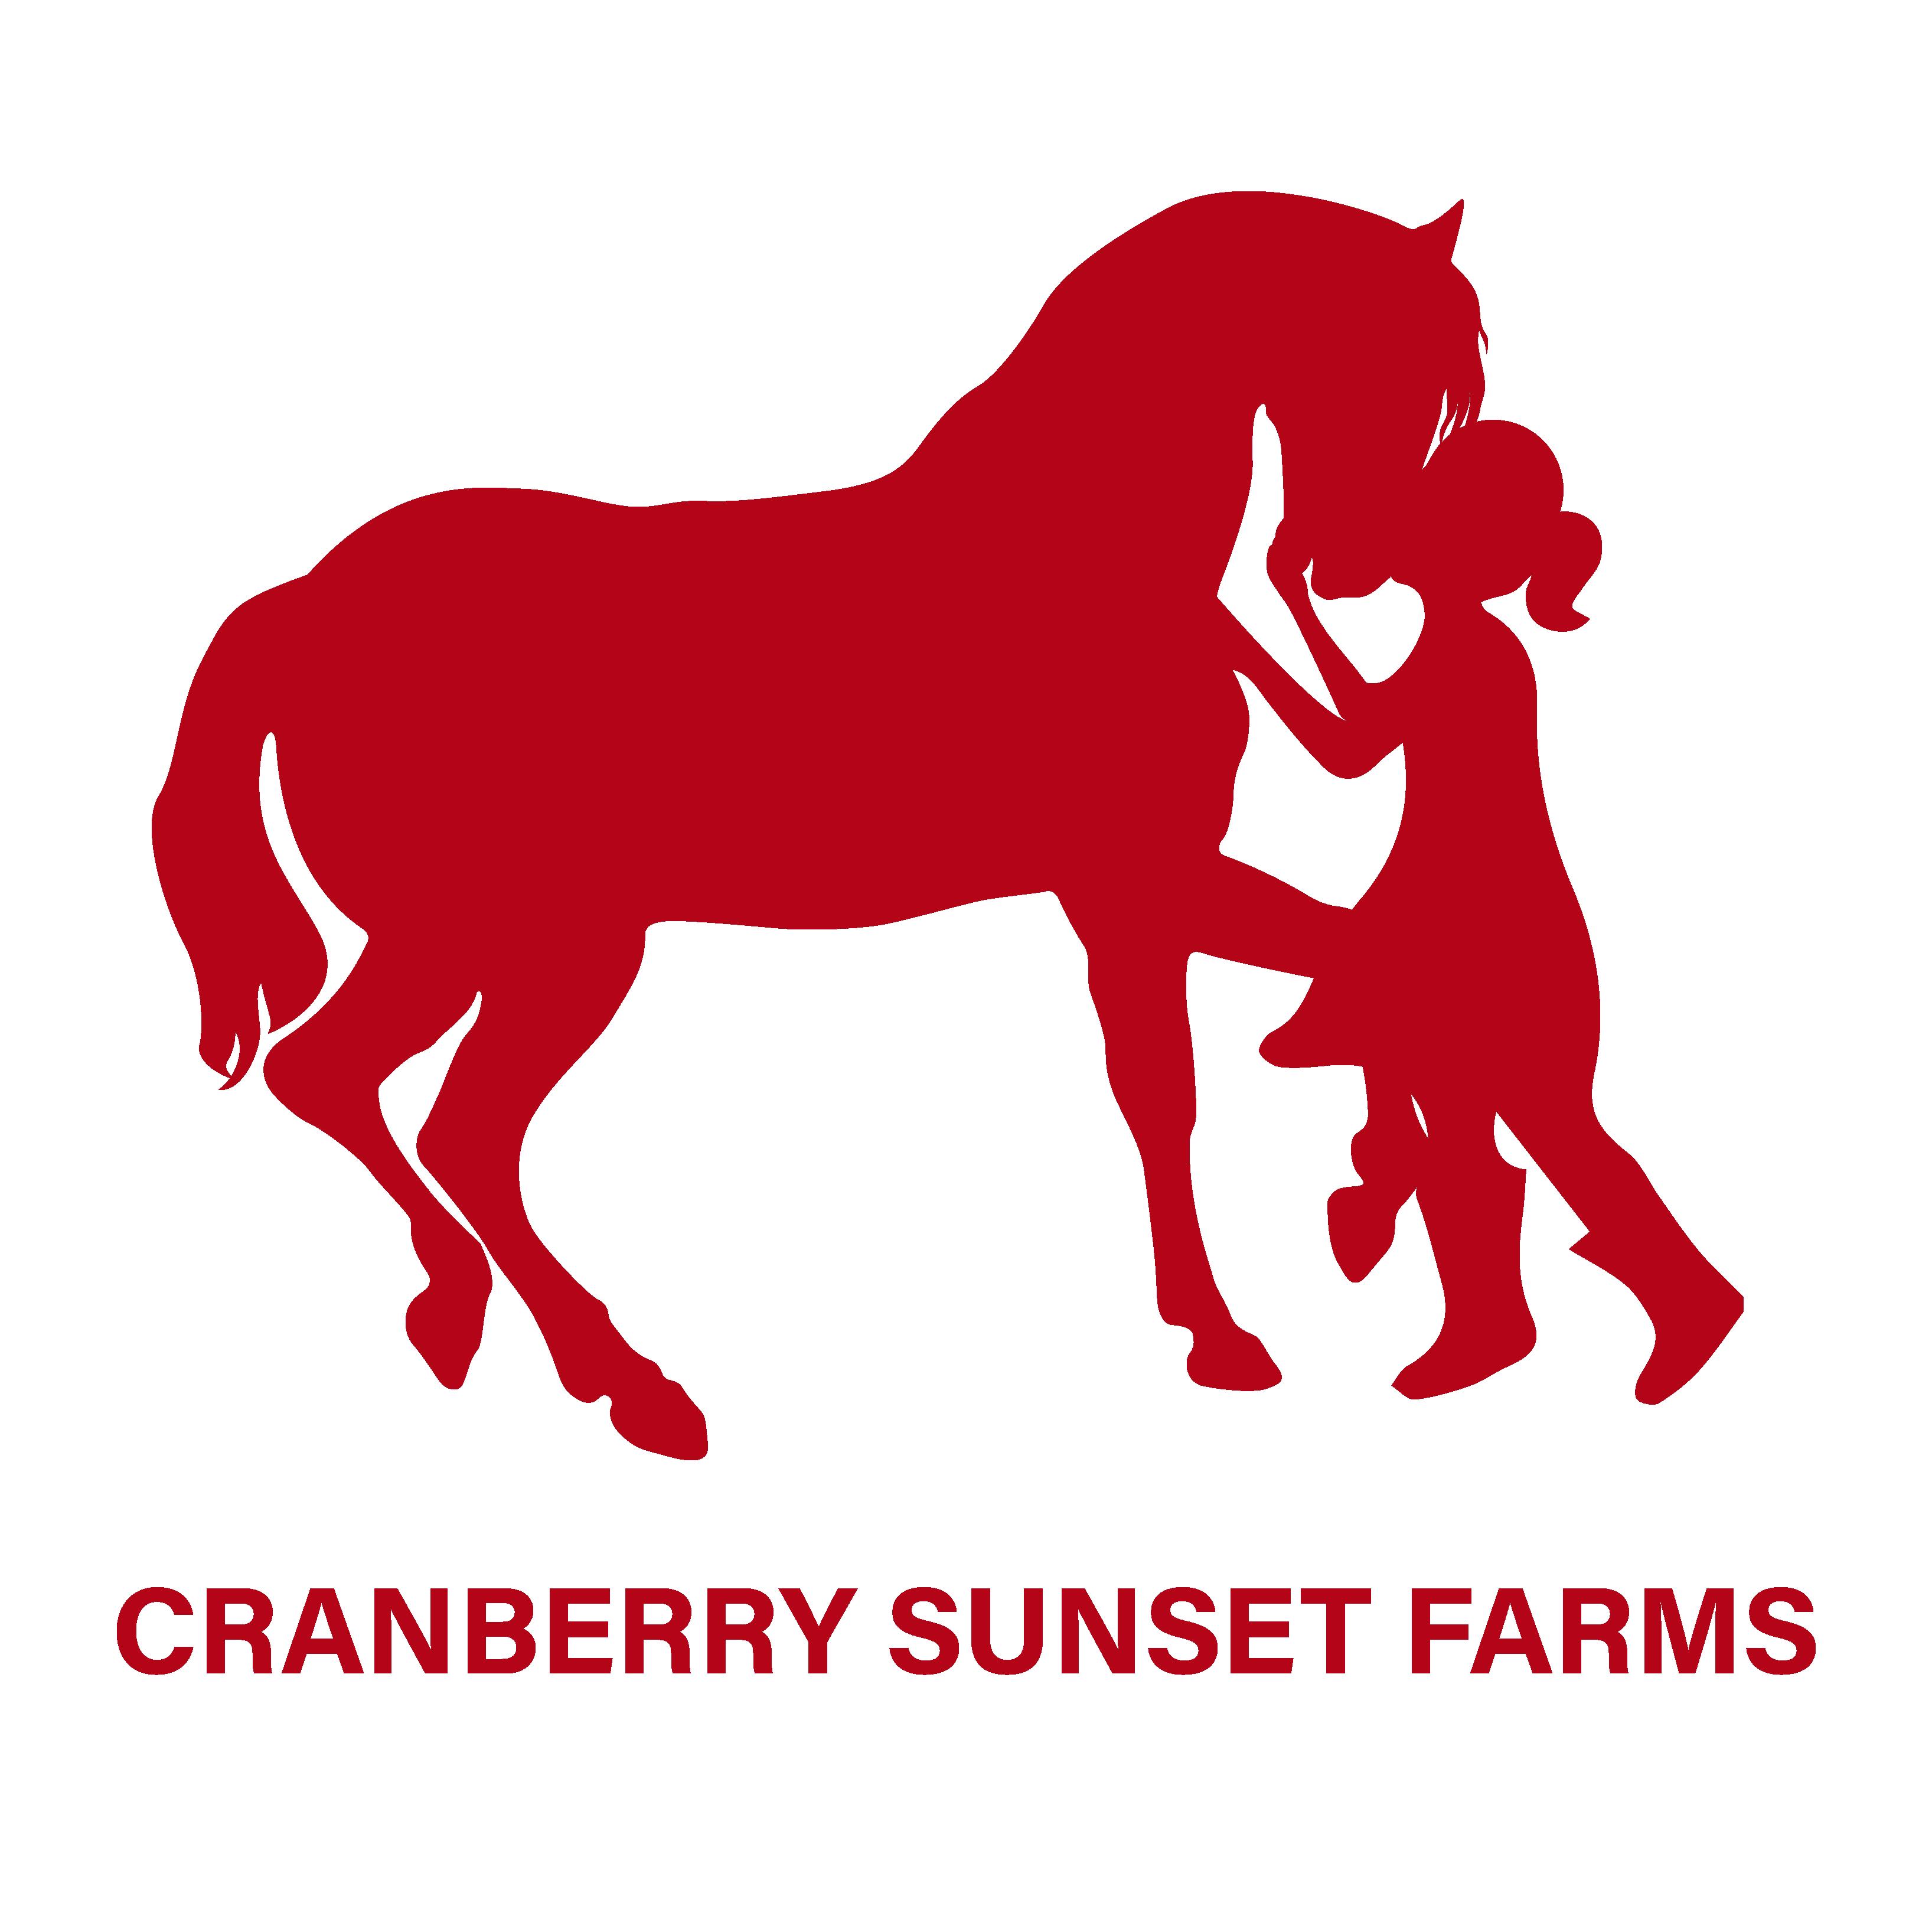 Cranberry Sunset Farm favicon